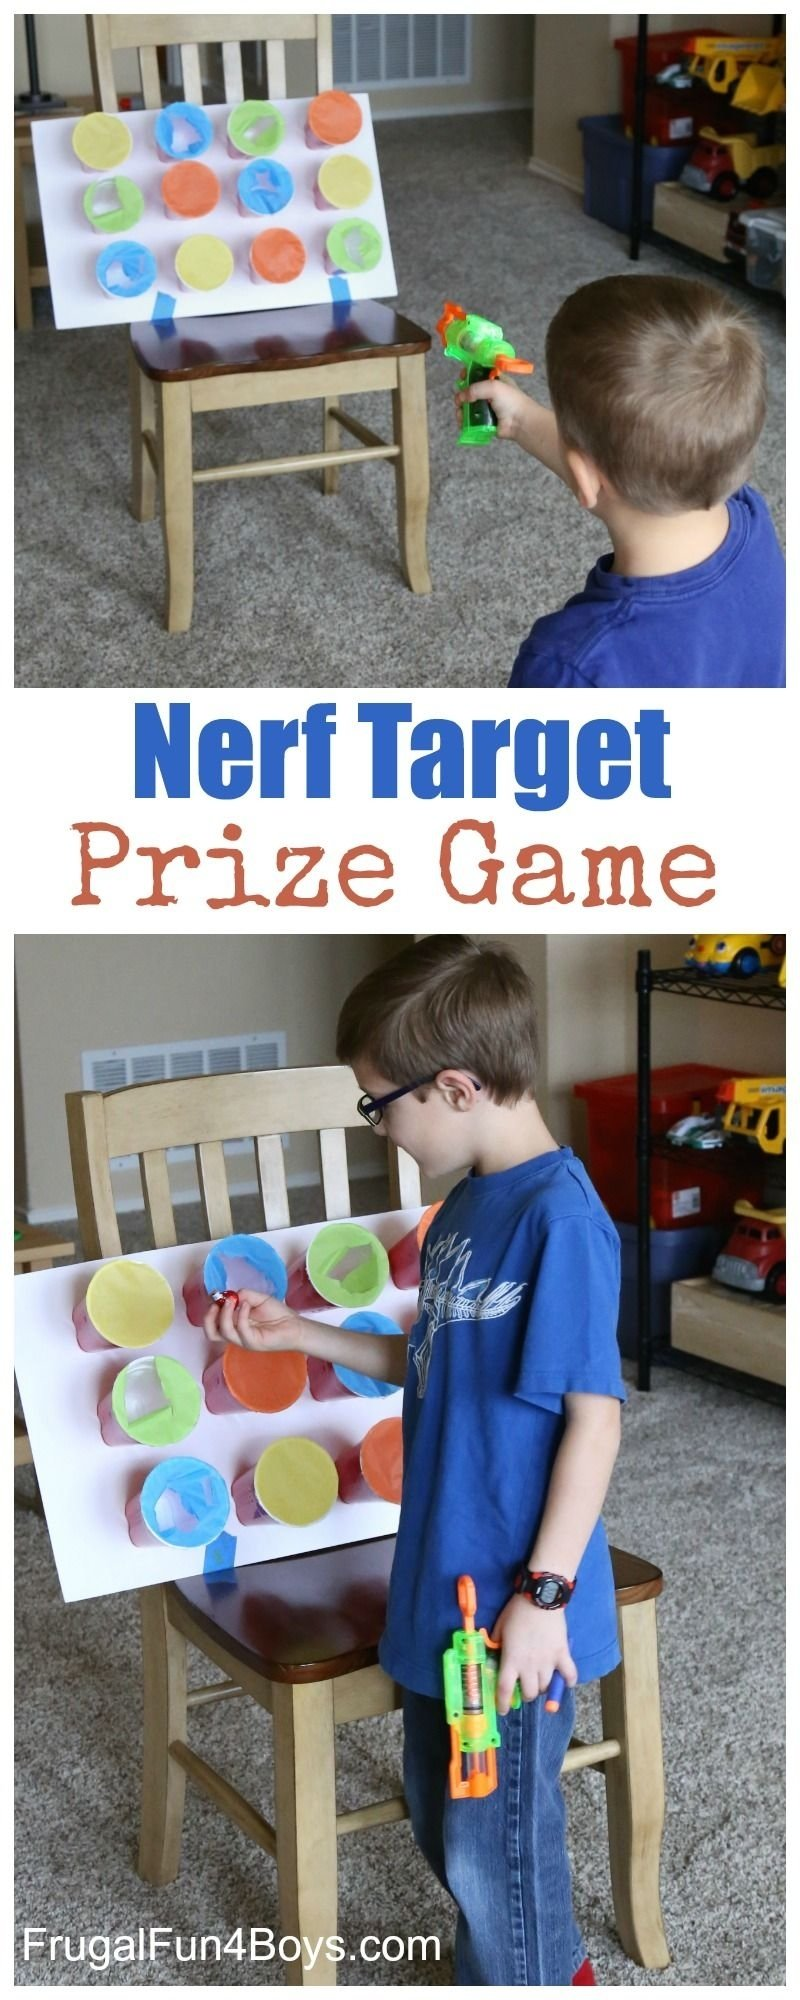 10 Fashionable Fun Game Ideas For Kids nerf target prize game fun party games party games and target 3 2020